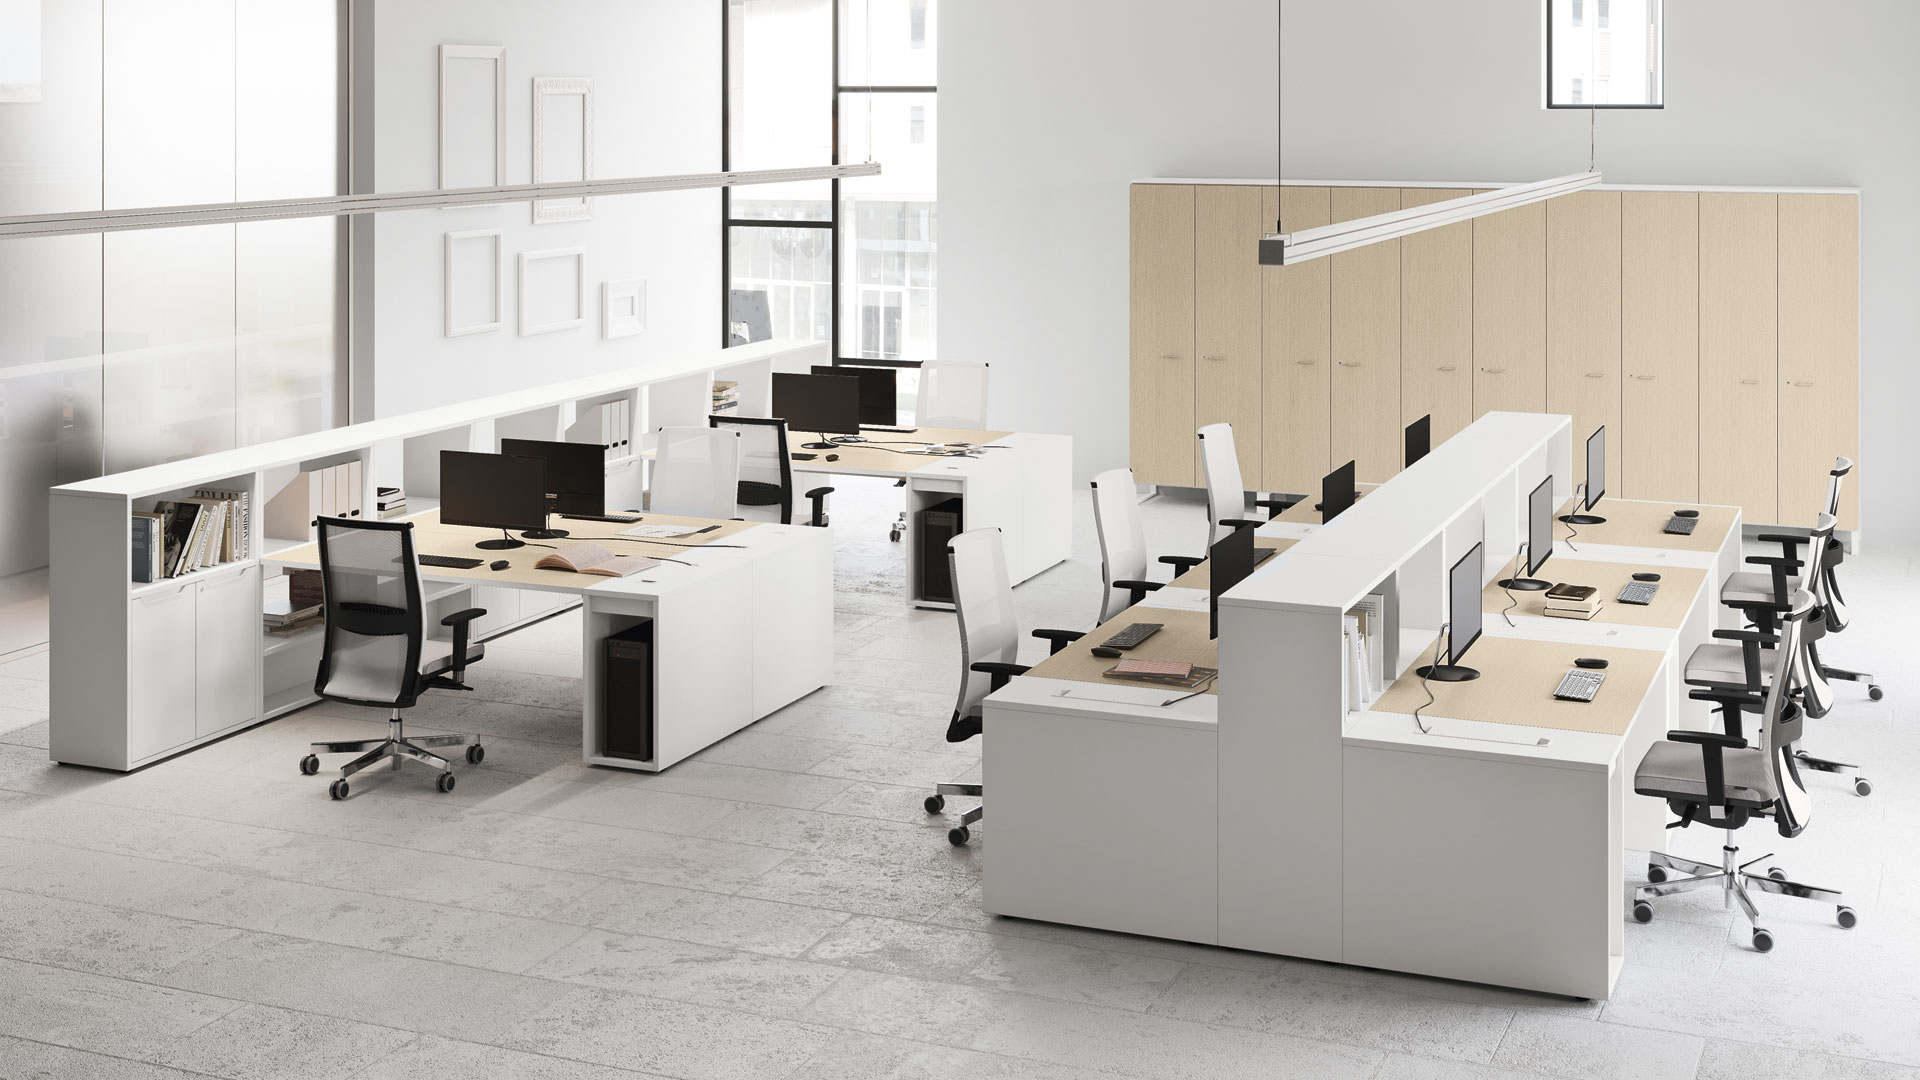 Mobiliario oficina girona for Mobiliario y equipo